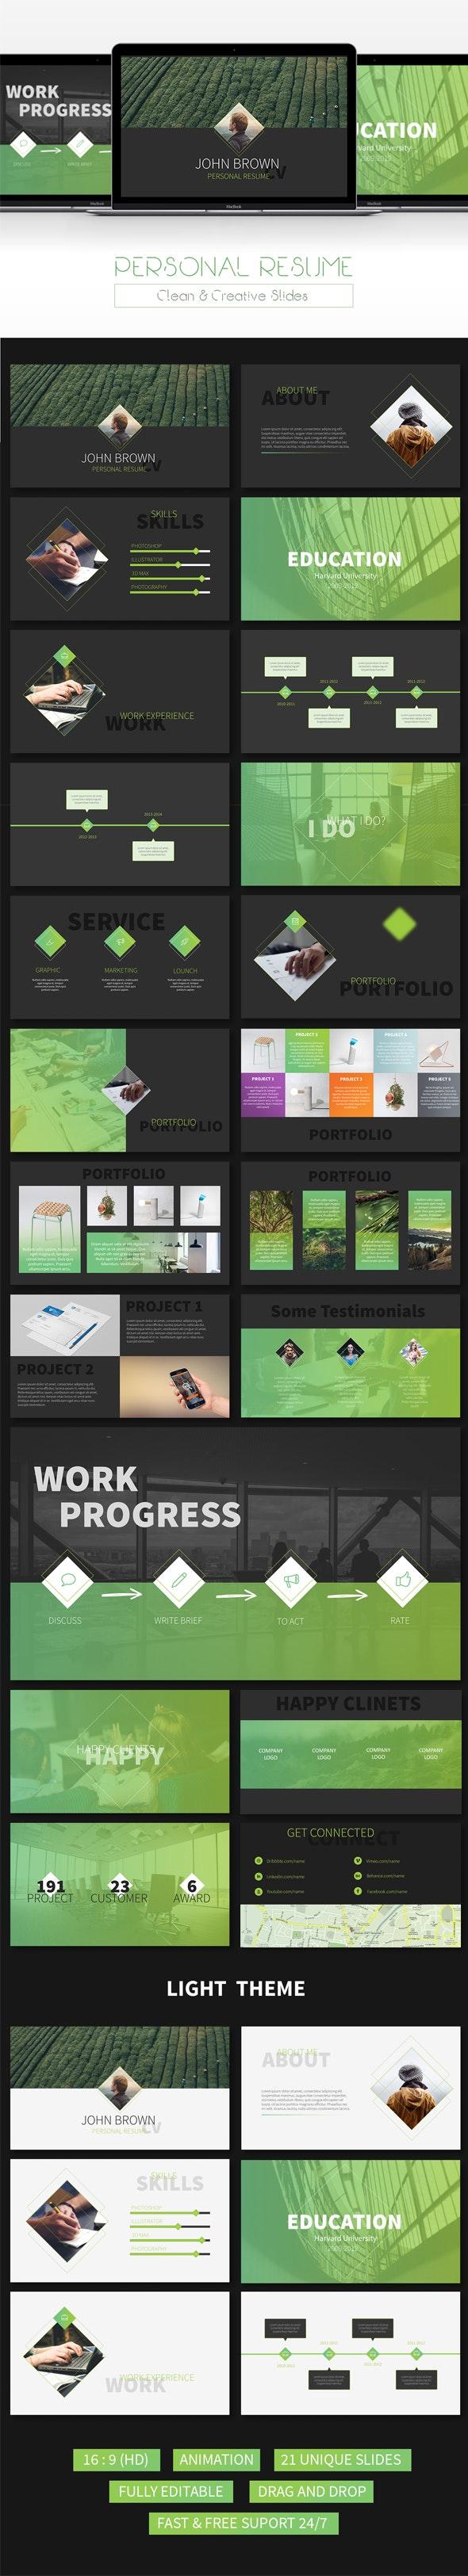 Resume - Creative Powerpoint Template - Creative PowerPoint Templates